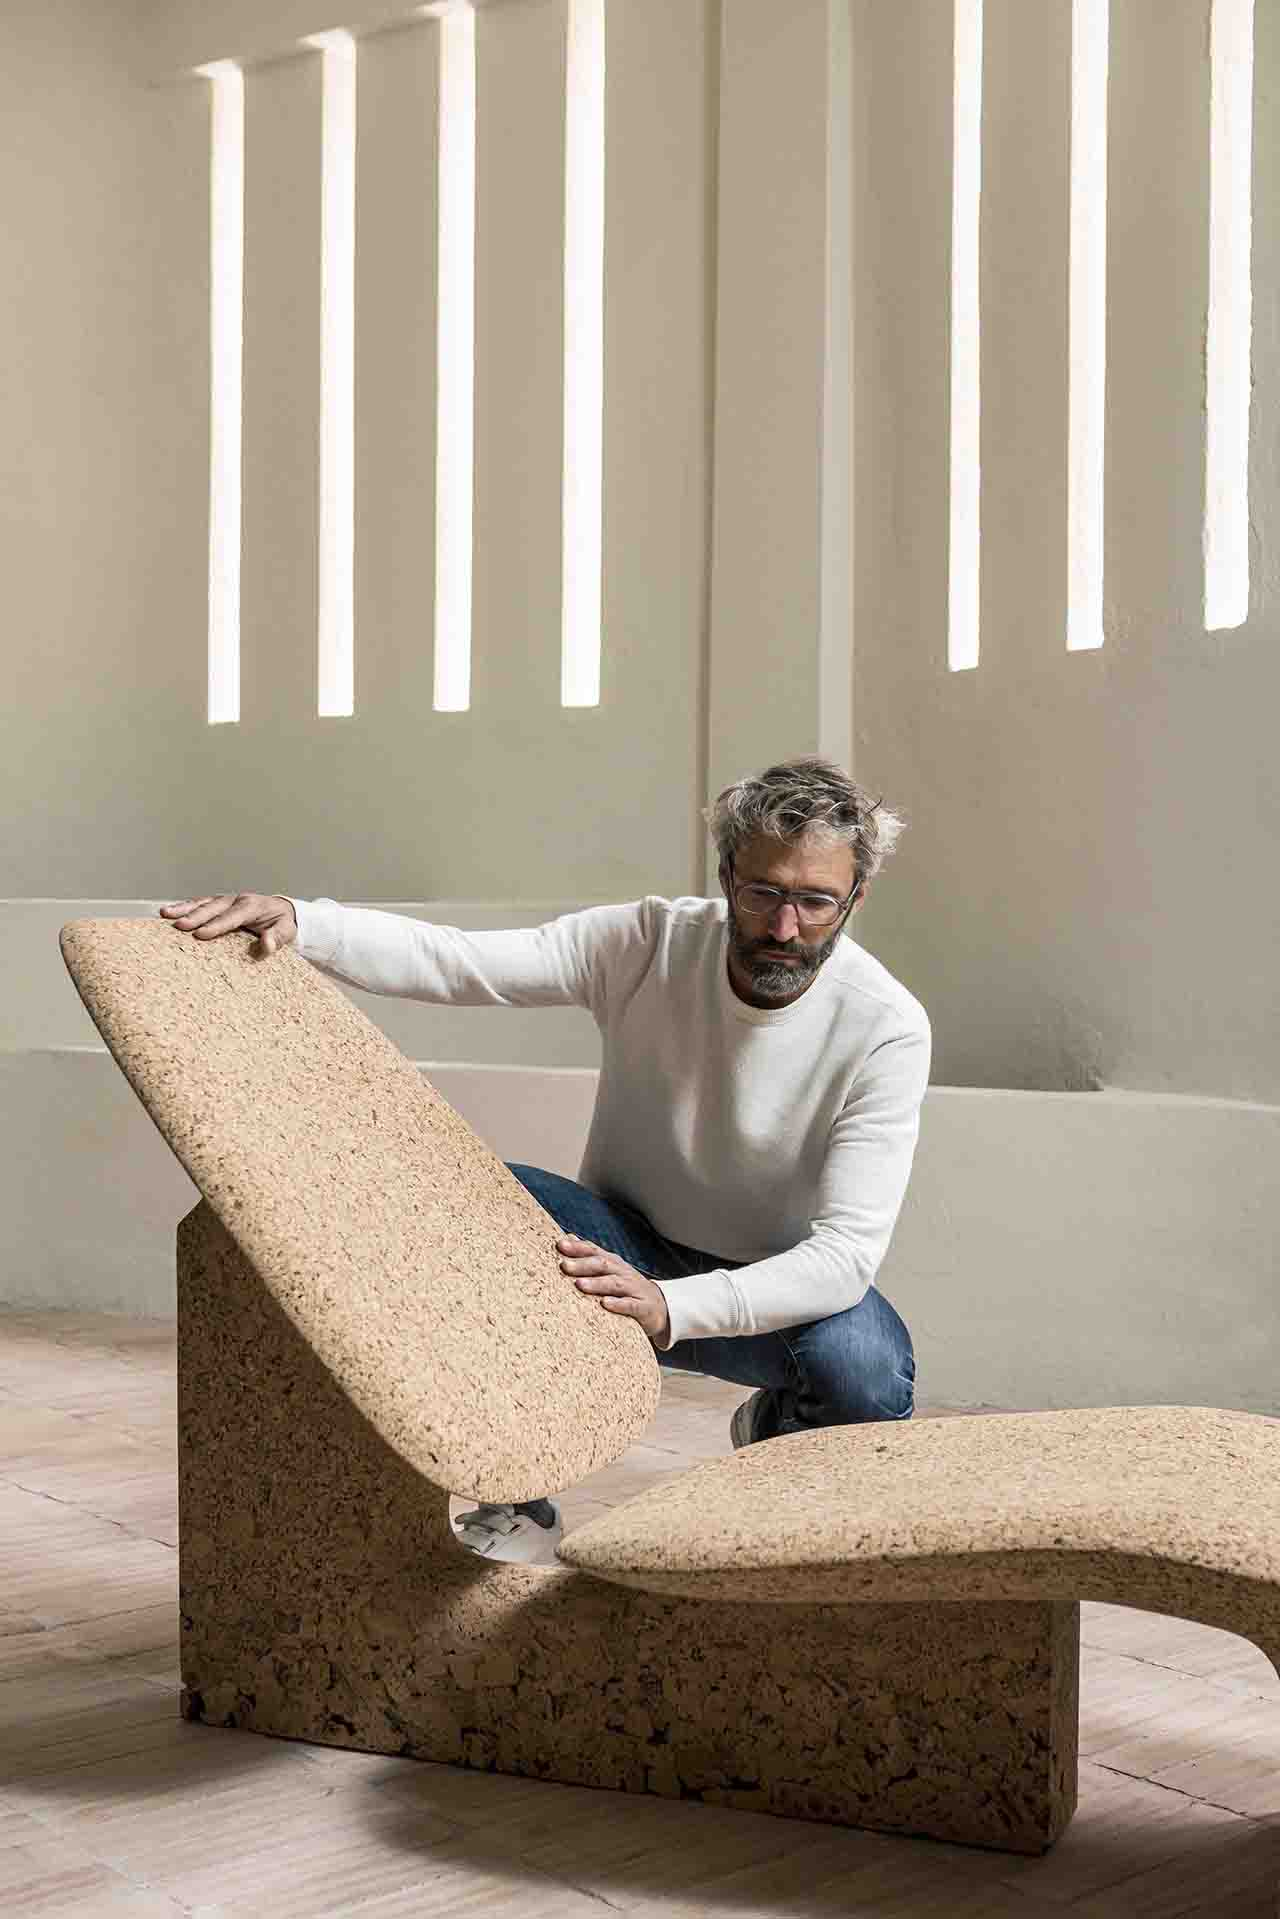 Noe Duchaufour-Lawrance with cork chaise lounge